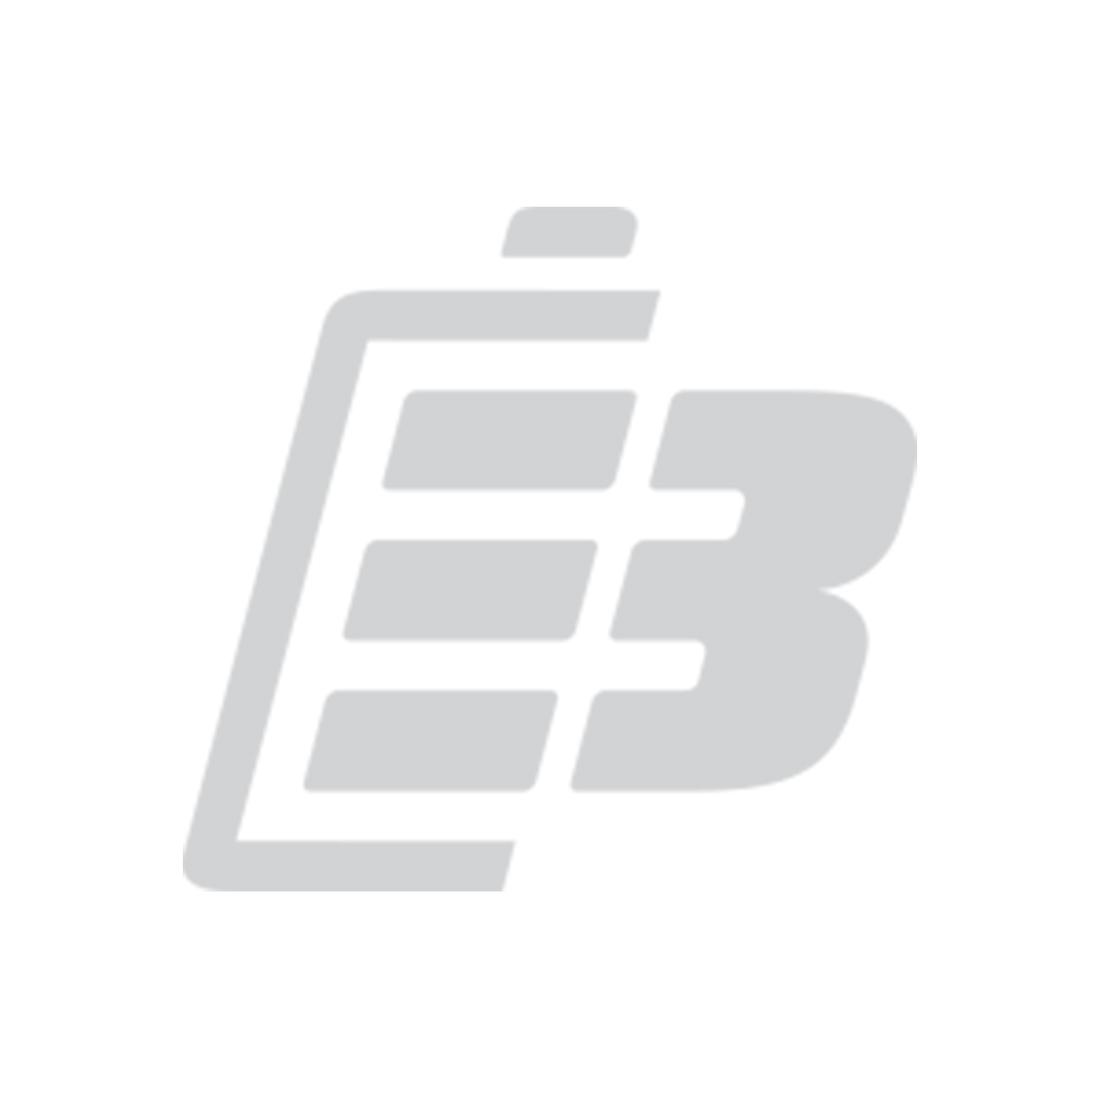 Micro USB to Lightning Adapter